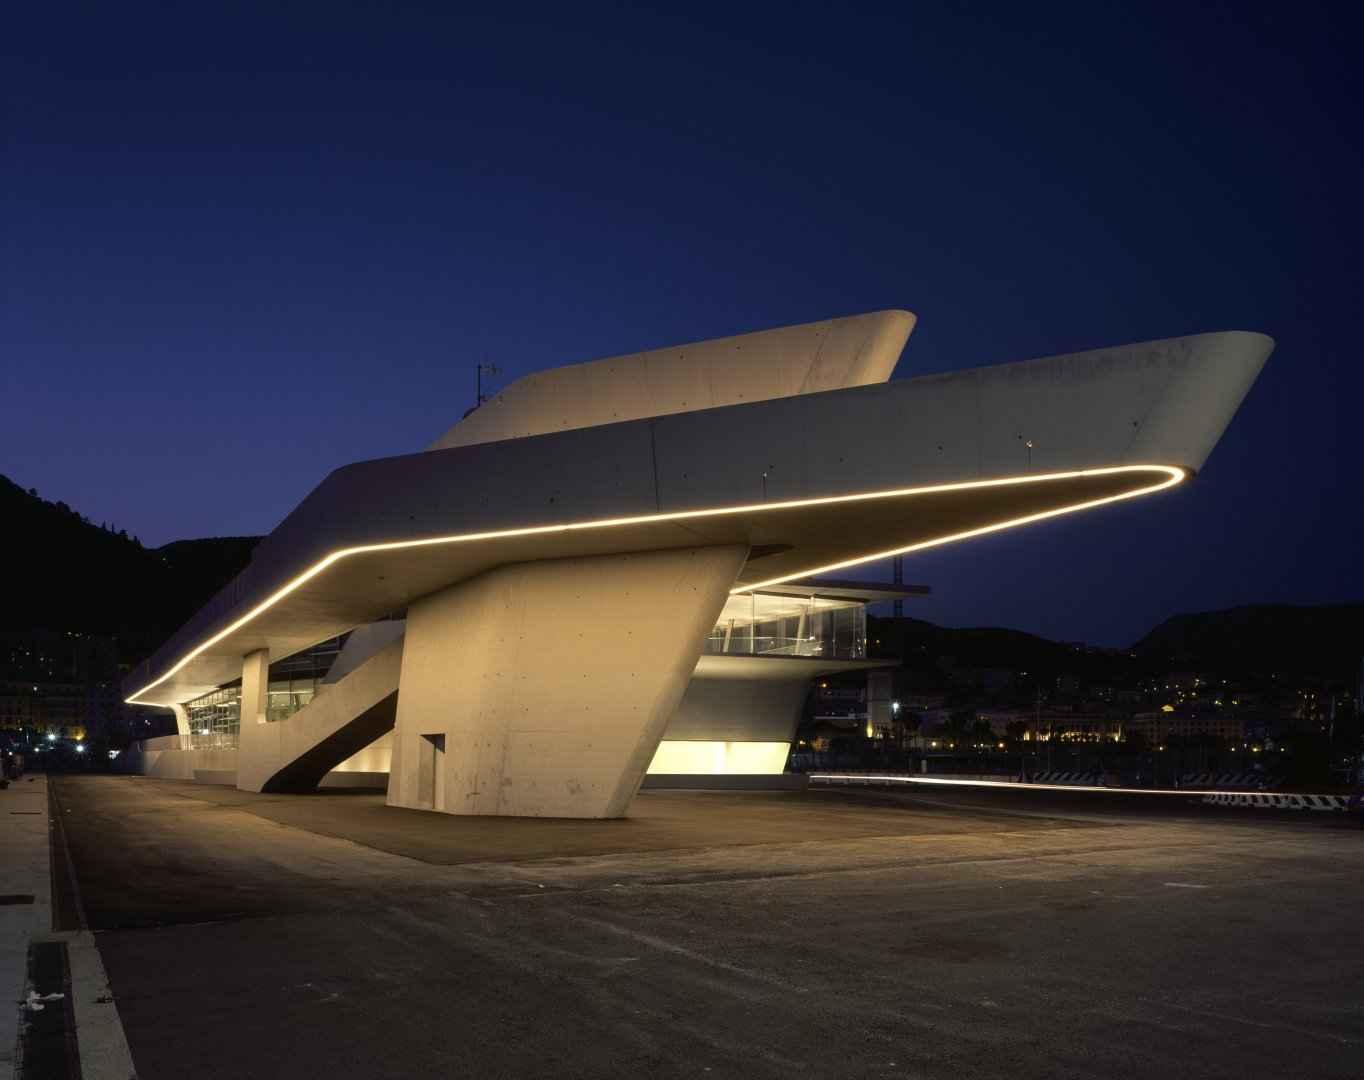 Inauguran terminal marítima en Italia, obra de Zaha Hadid